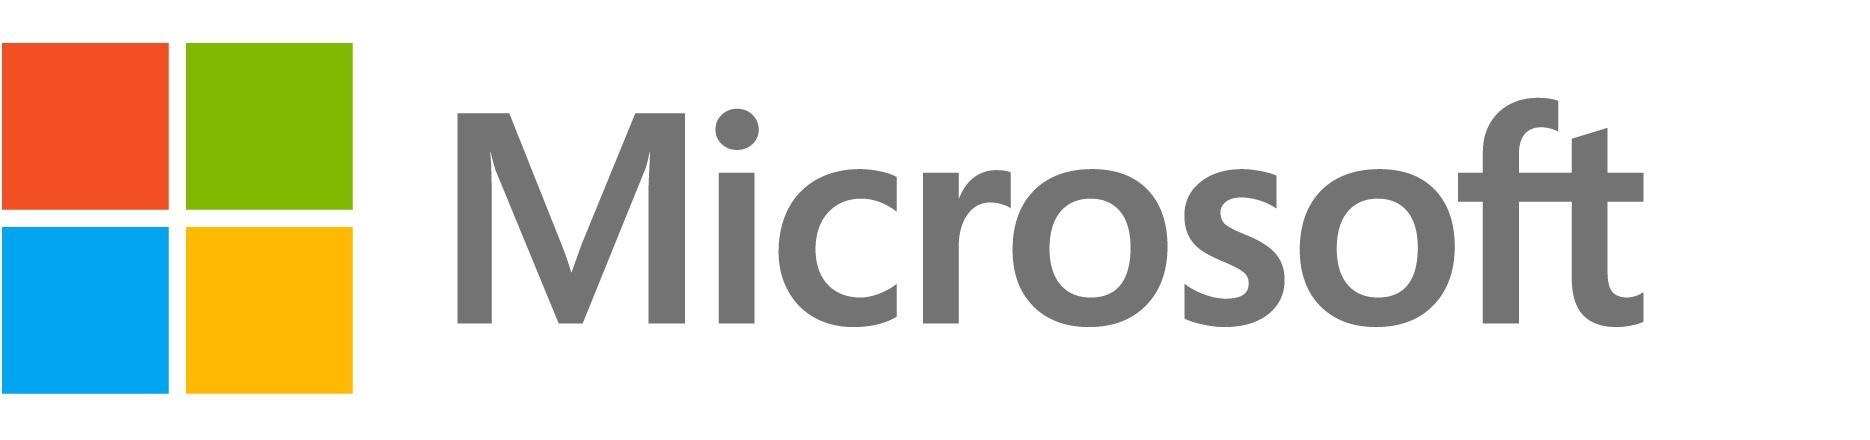 microsoft_logo+2.jpg